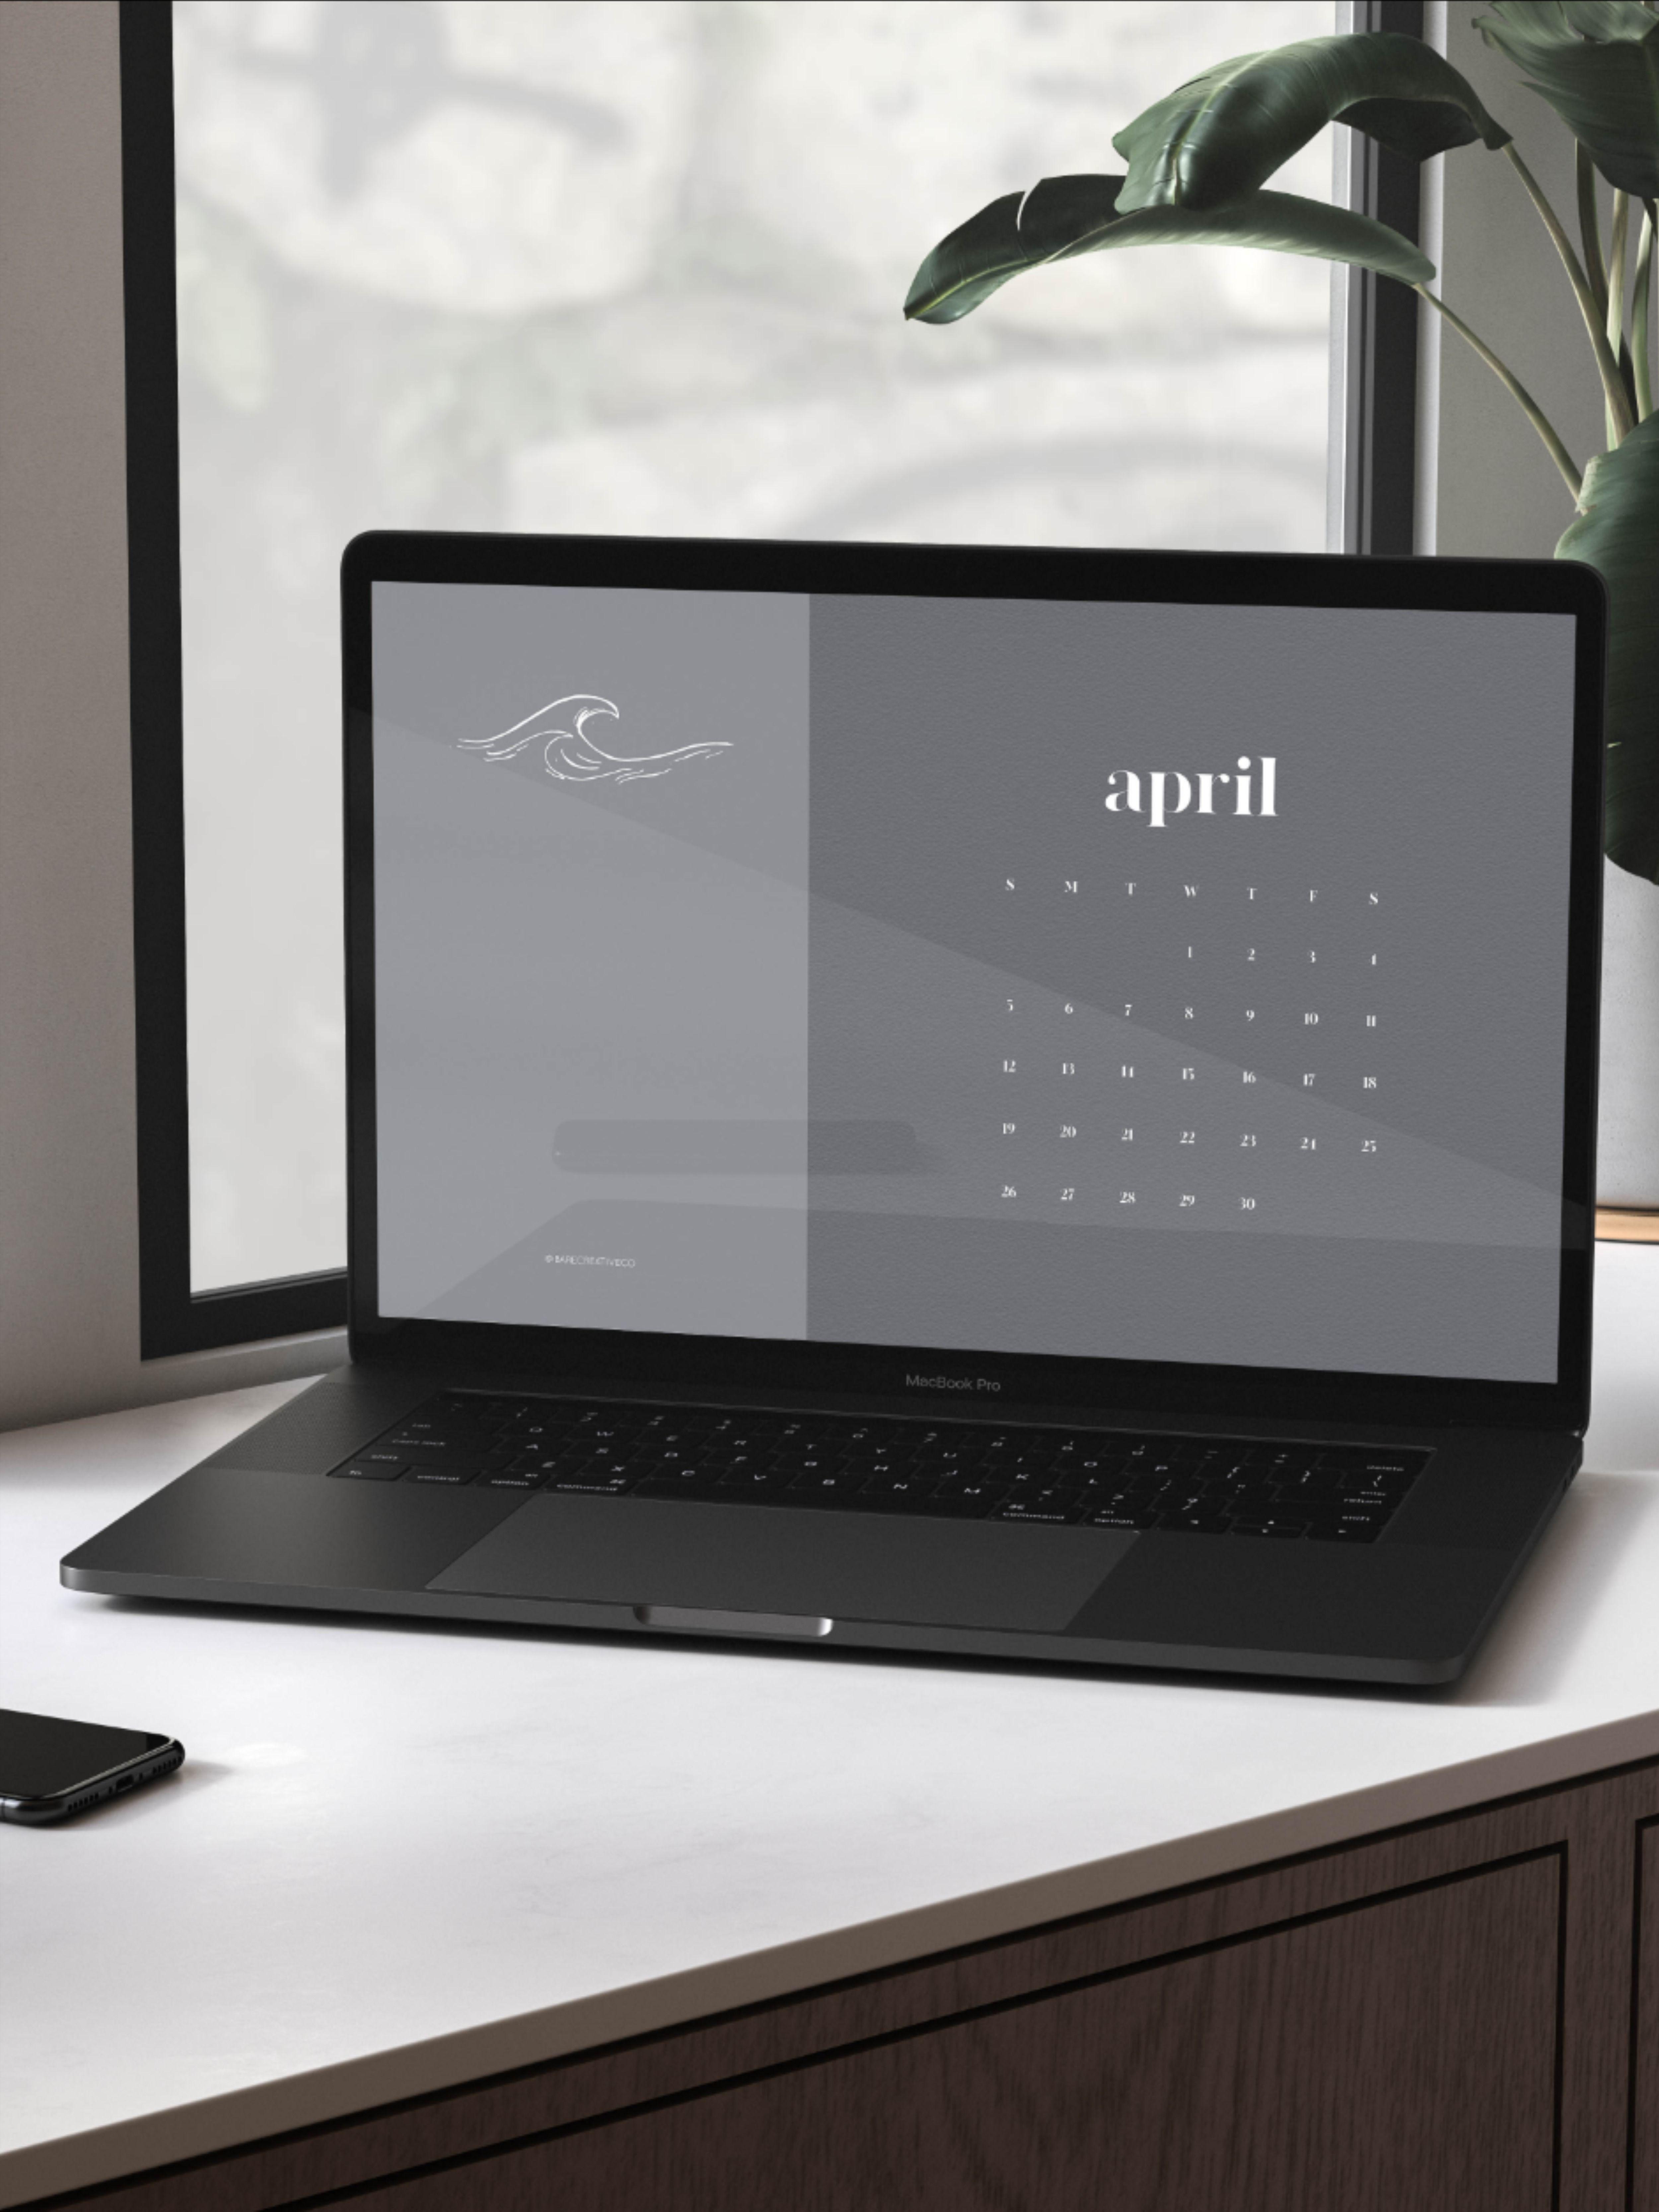 2020 Desktop Wallpaper Calendar MacBook Desktop Calendar